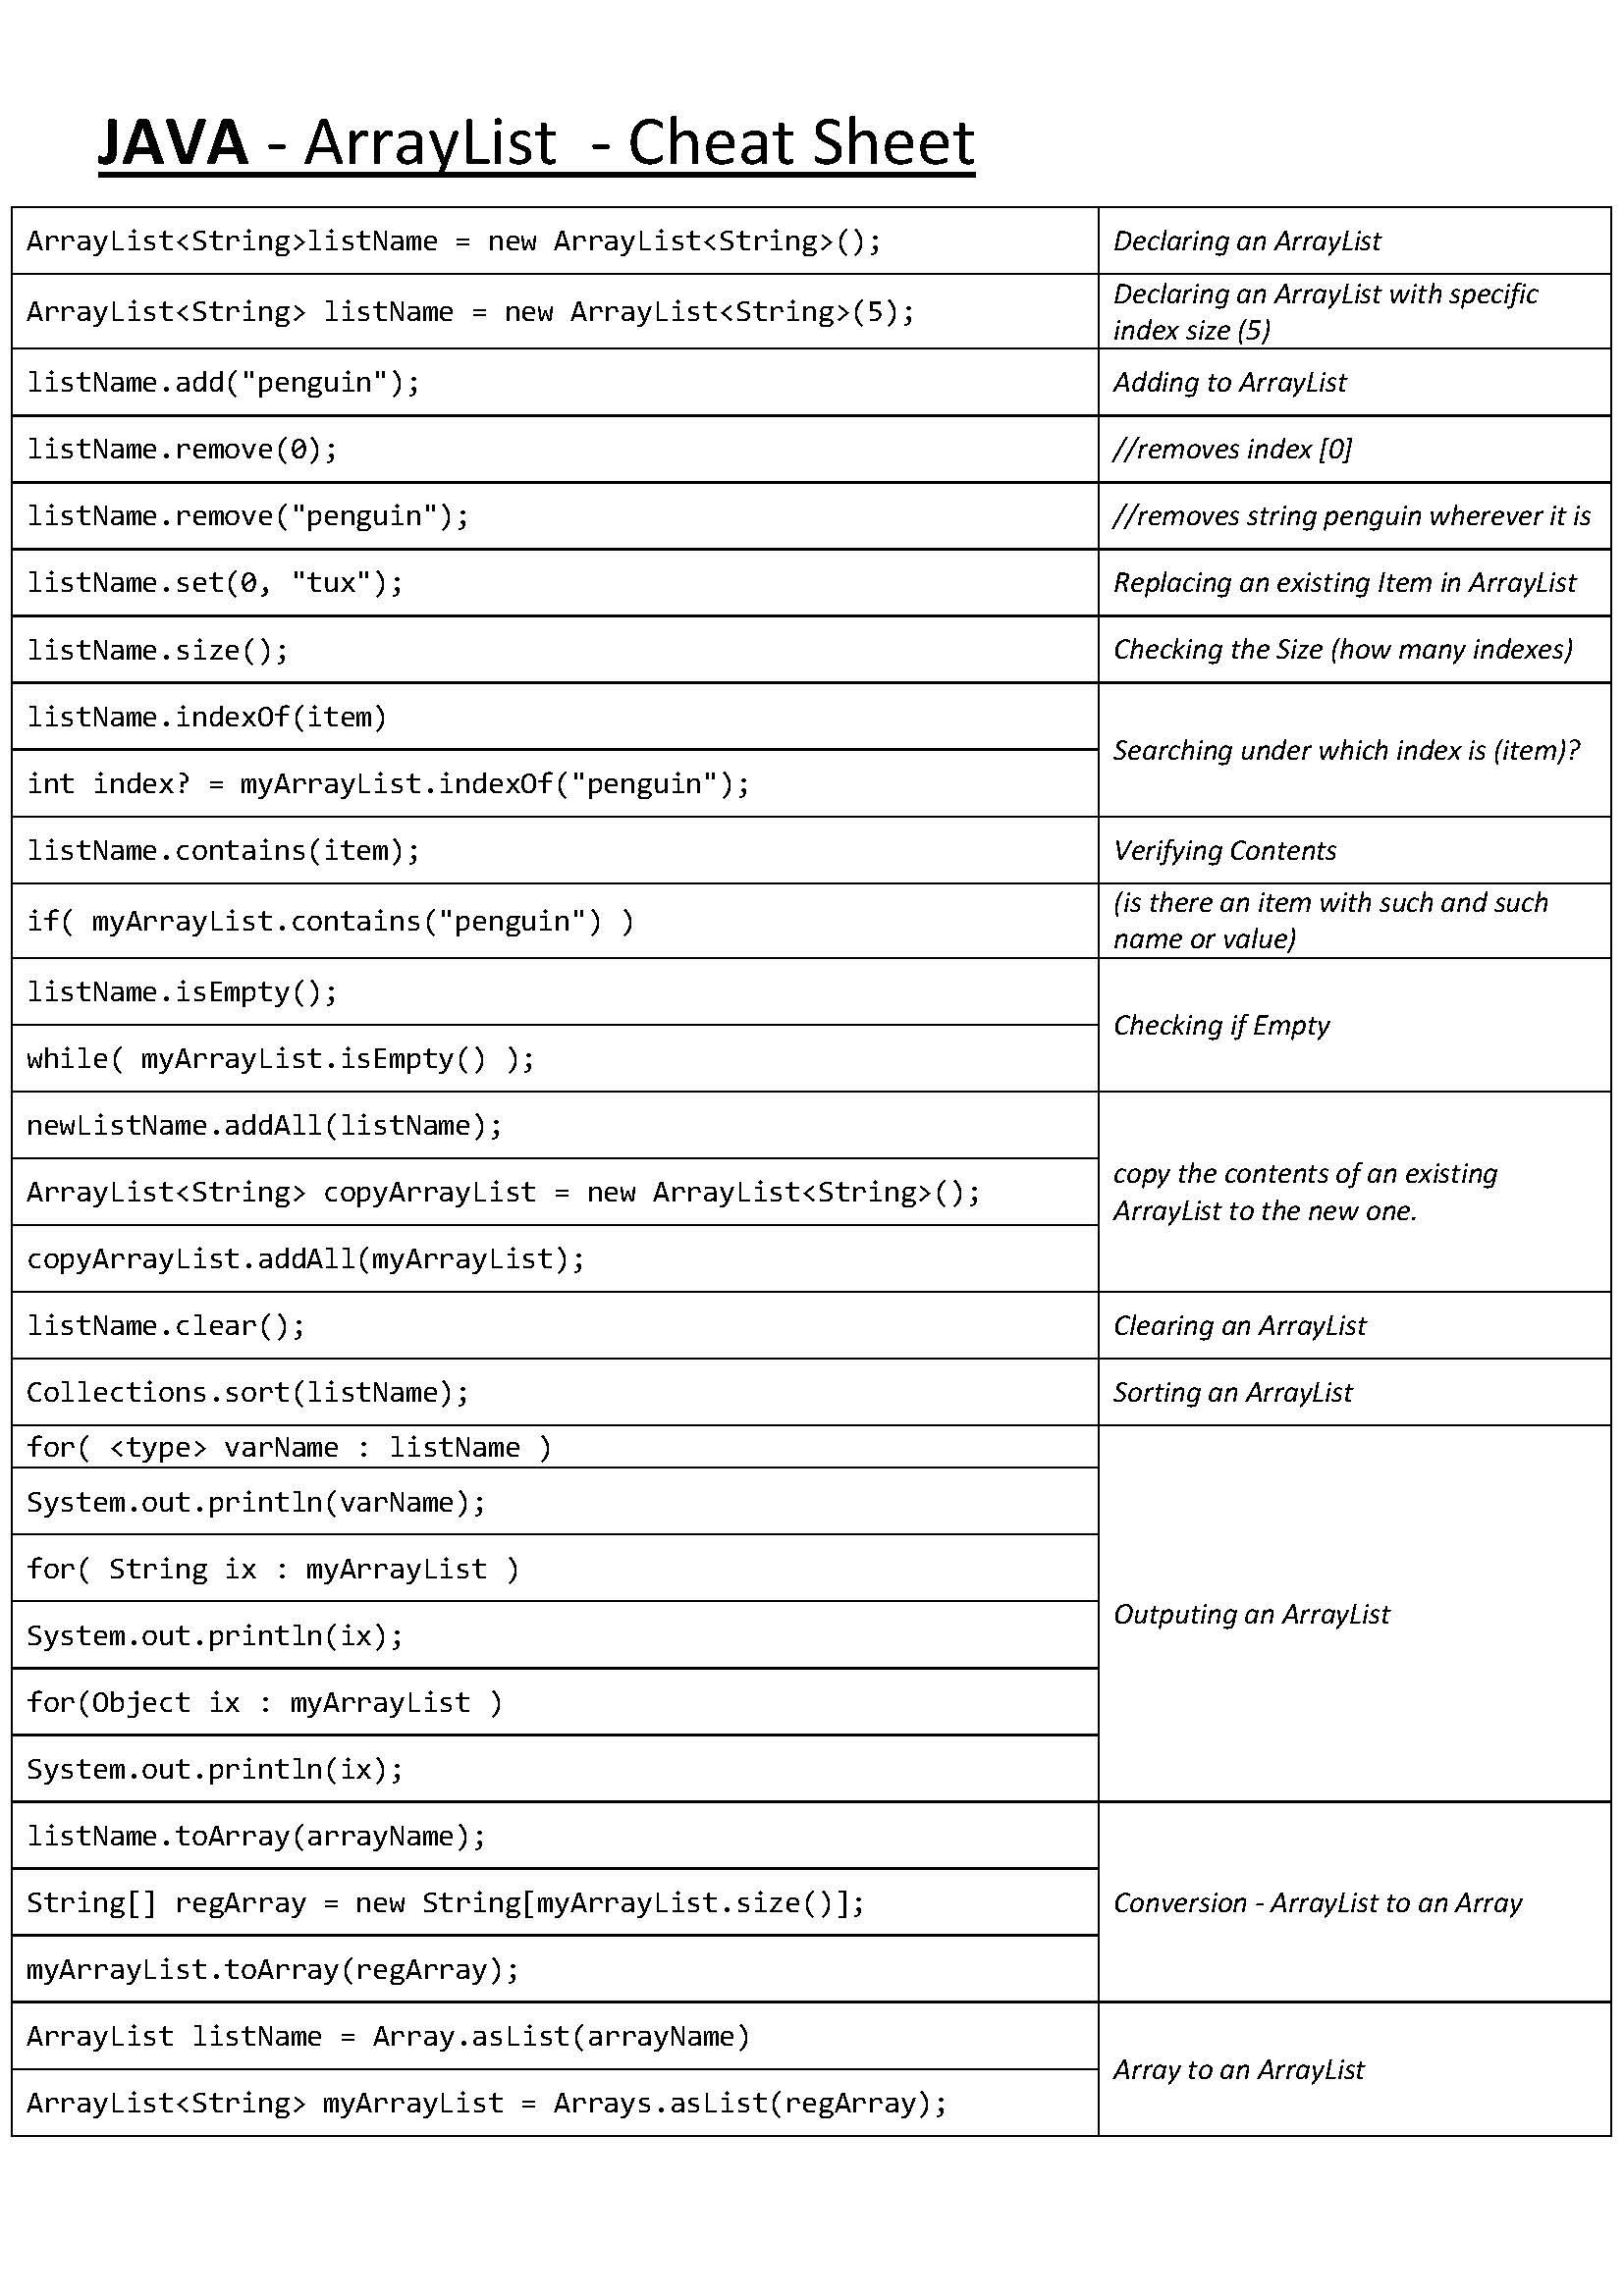 JAVA - ArrayList - Cheat Sheet